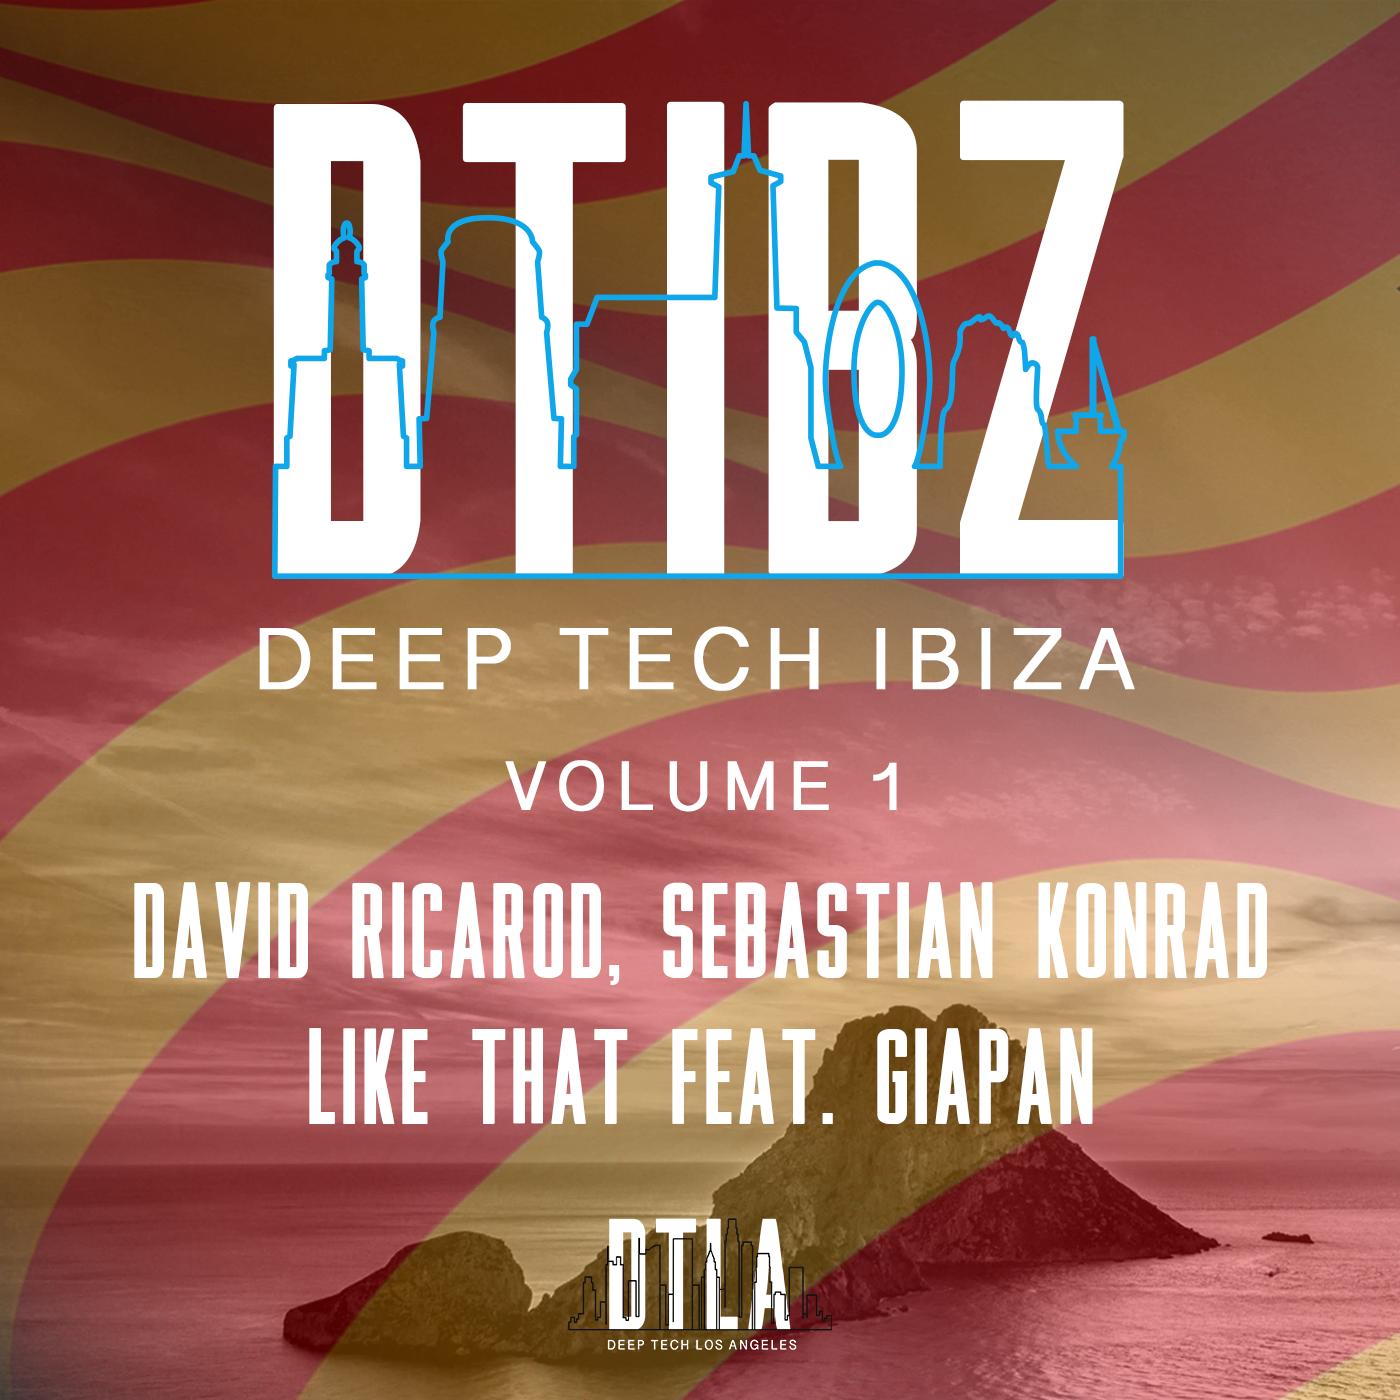 Deep Tech LA - Like That